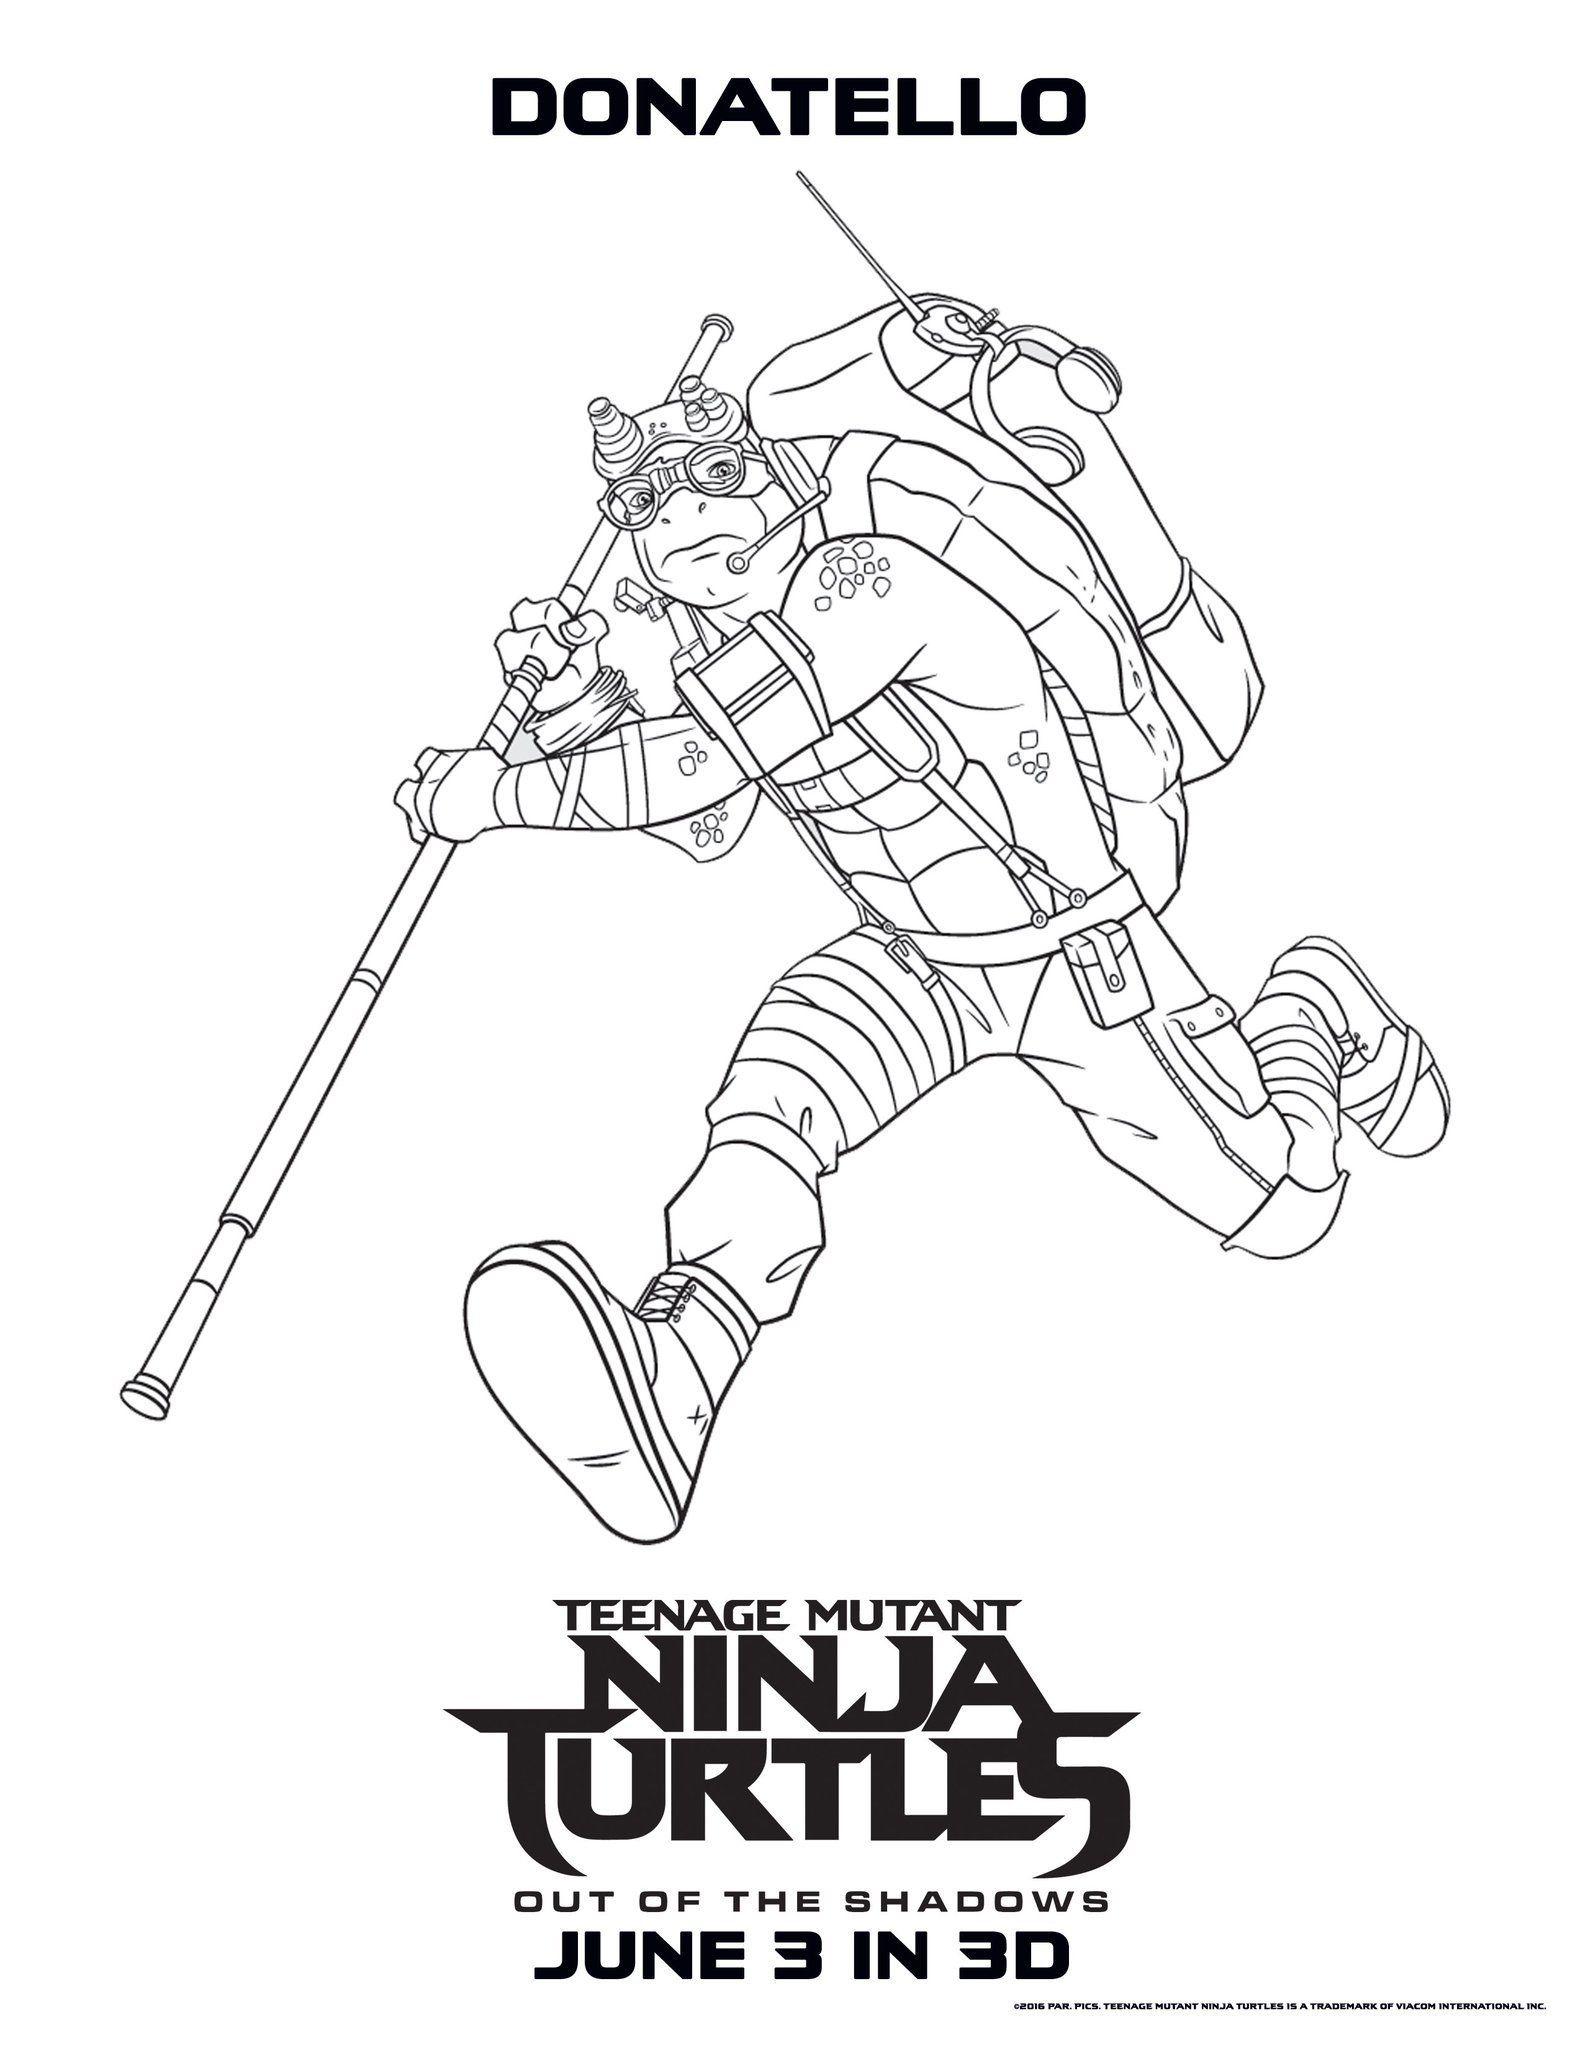 Ninja Turtles Coloring Games Teenage Mutant Ninja Turtles Coloring Pages Best Coloring In 2020 Ninja Turtle Coloring Pages Turtle Coloring Pages Coloring Books